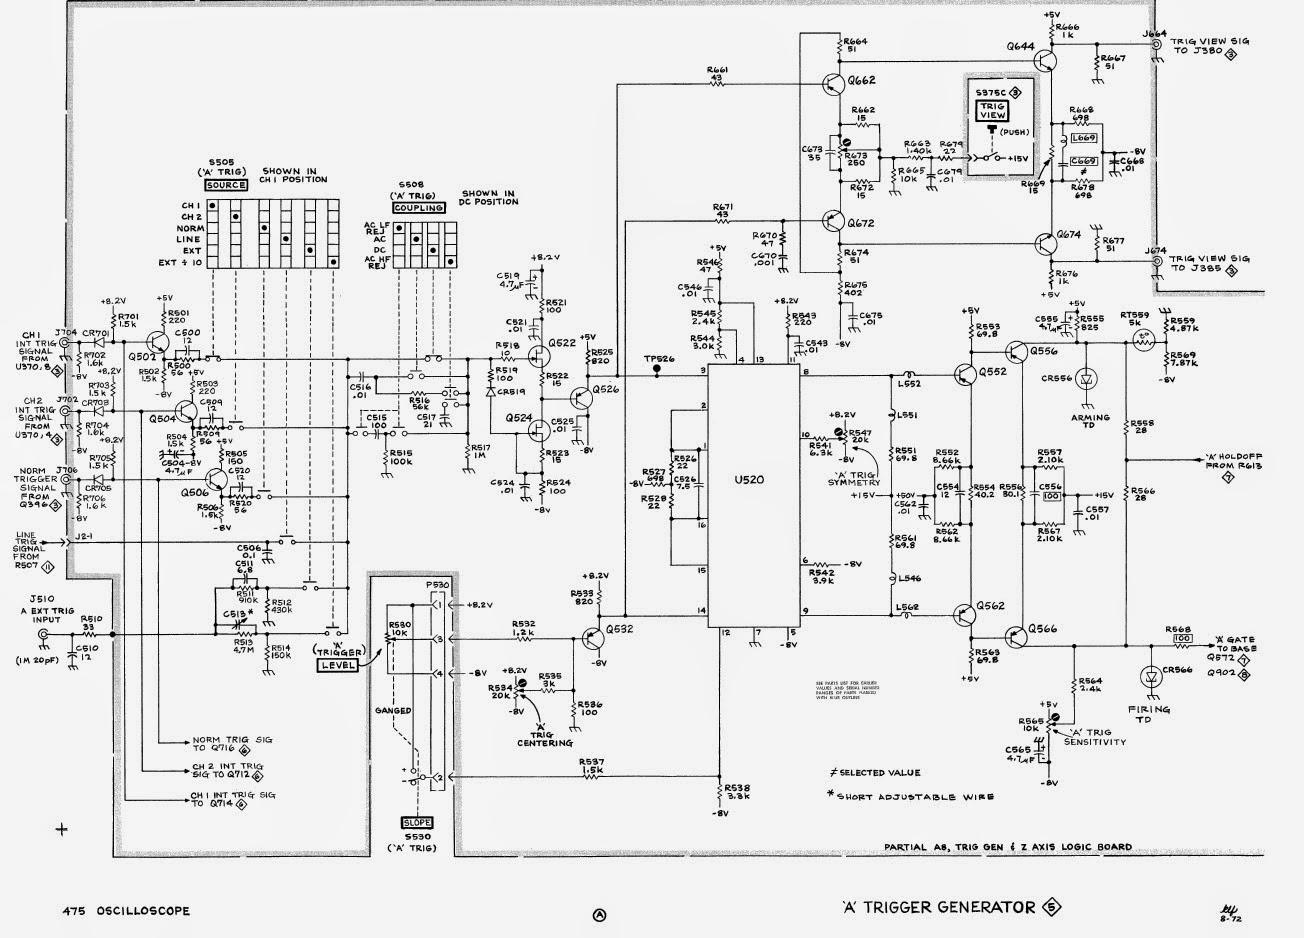 Tektronix 2336 Ya service manual